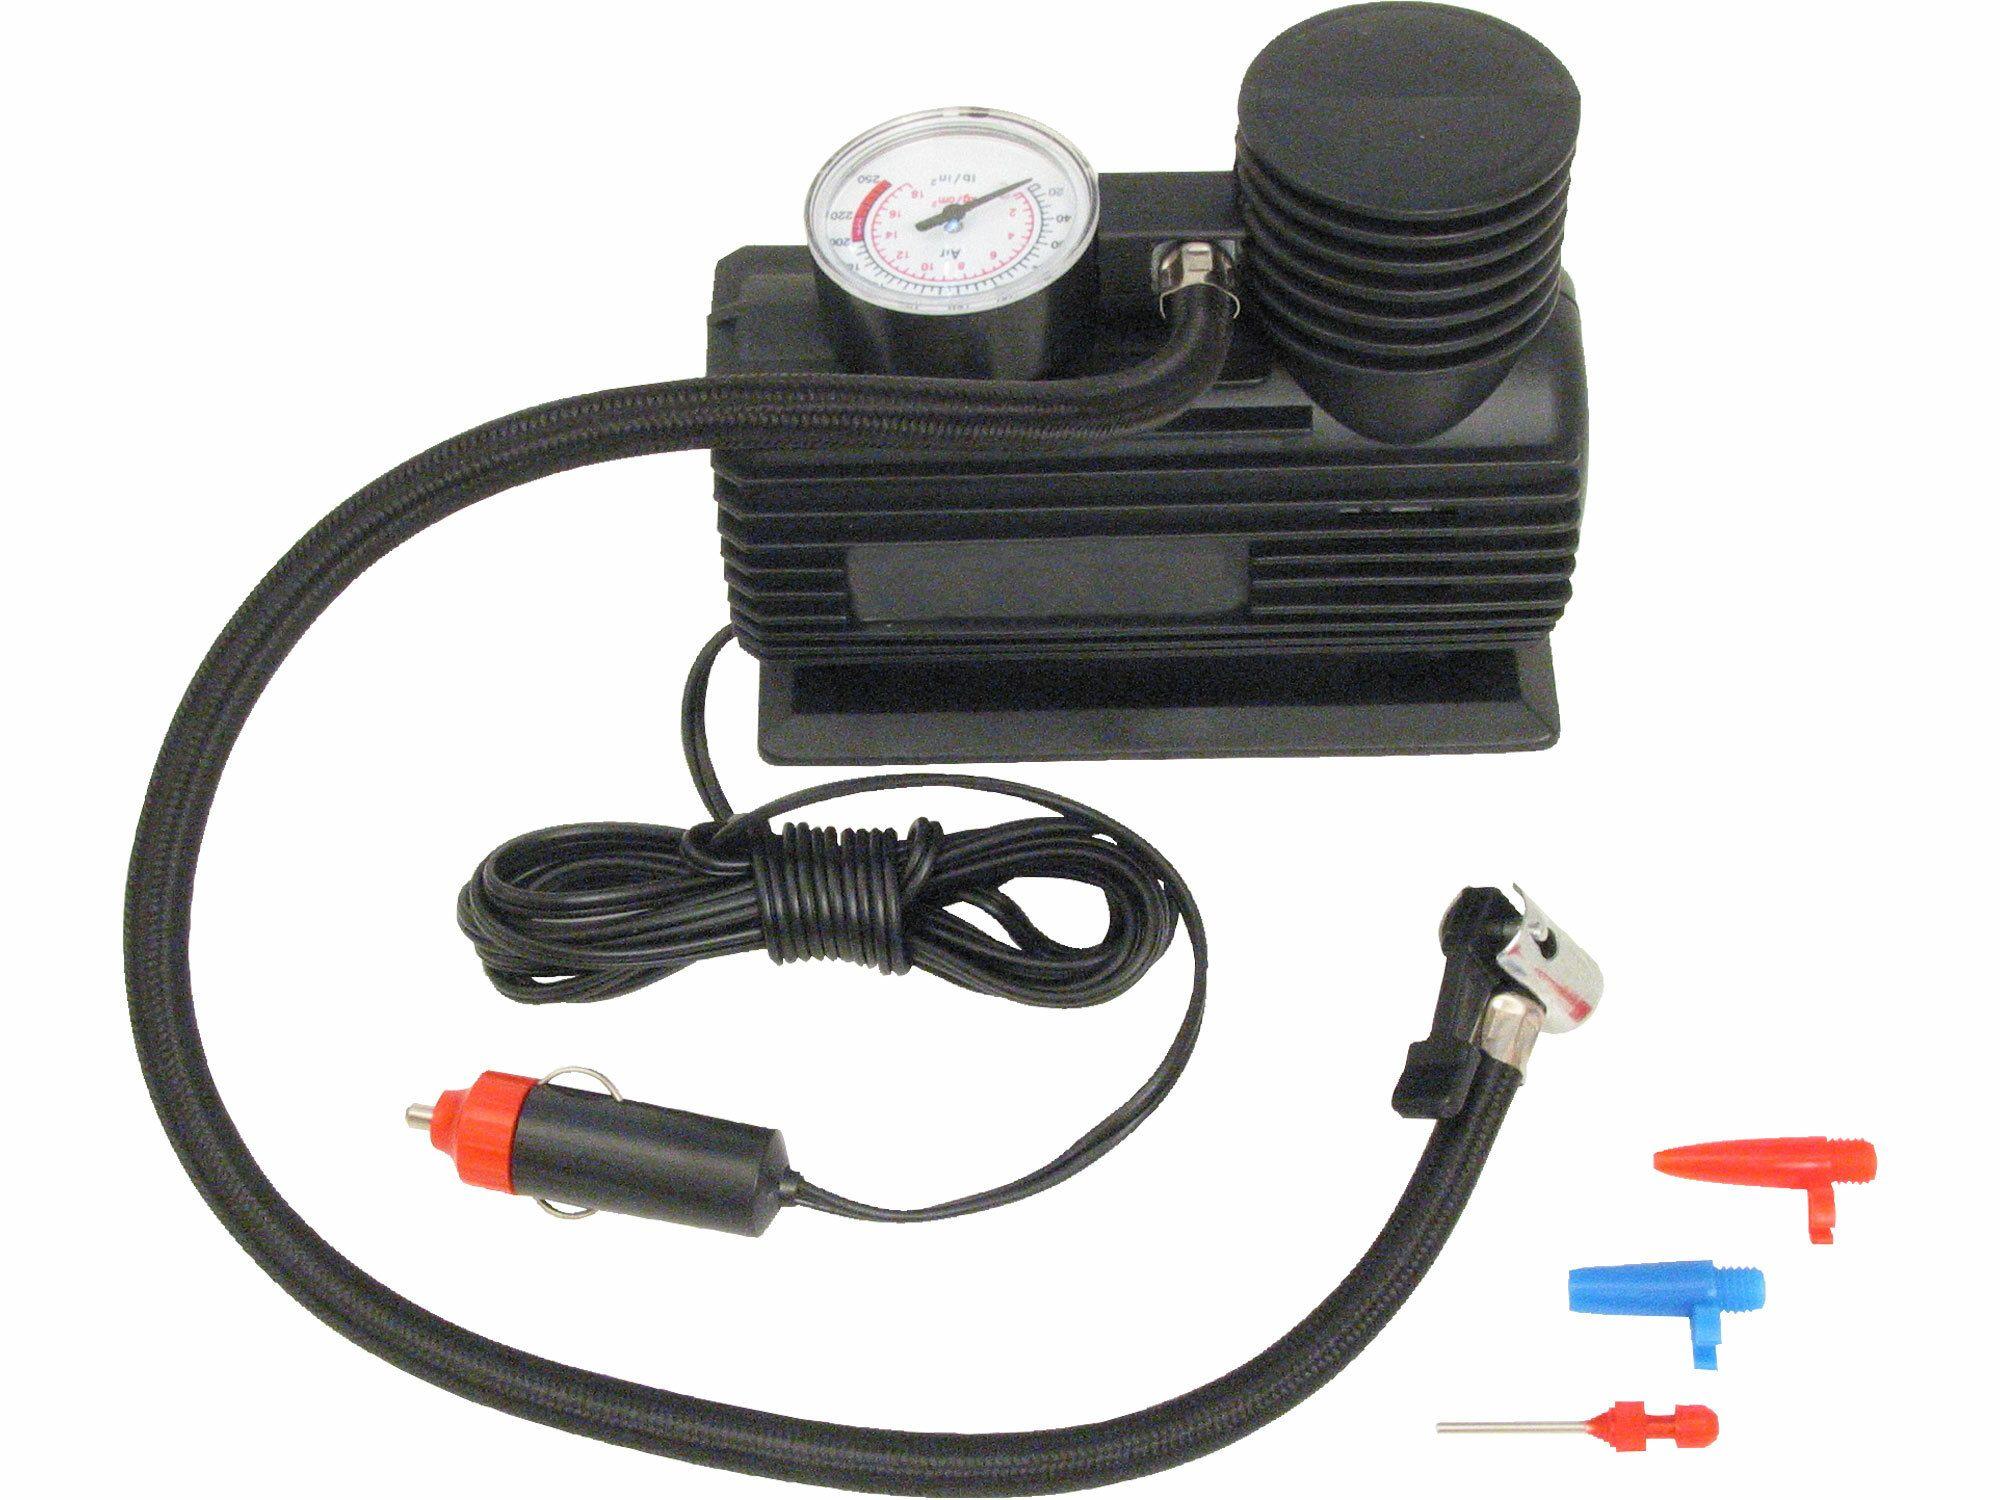 Kompresor mini 12V, 250PSI/1,7MPa, manometr, kabel 3m, 252